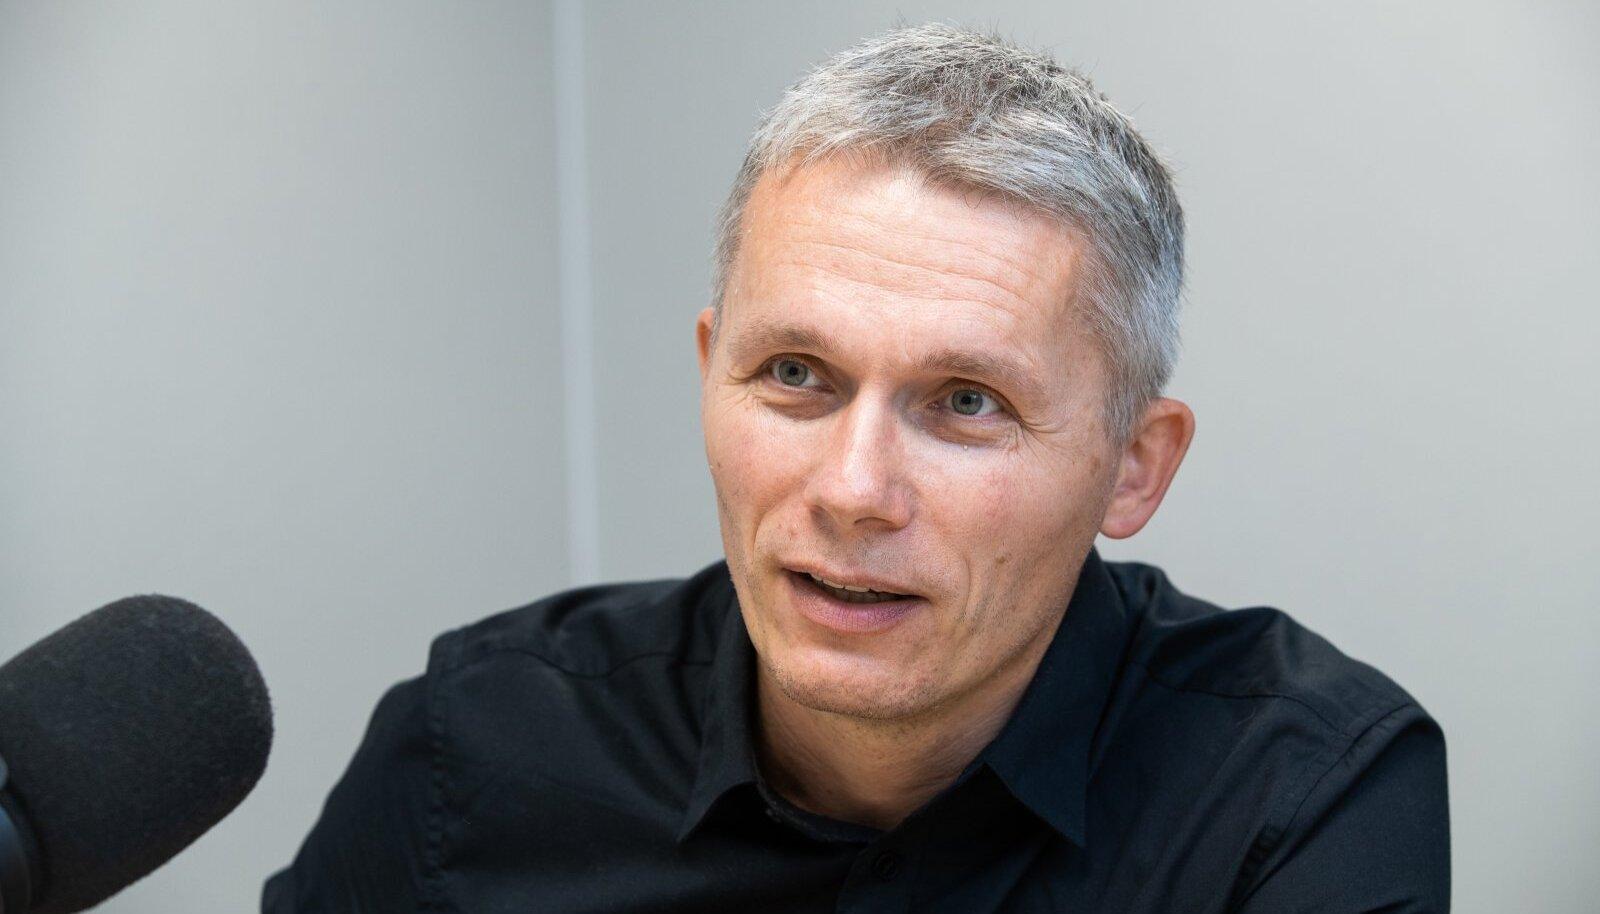 Sihtasutus Liberaalne Kodanik juht Tarmo Jüristo